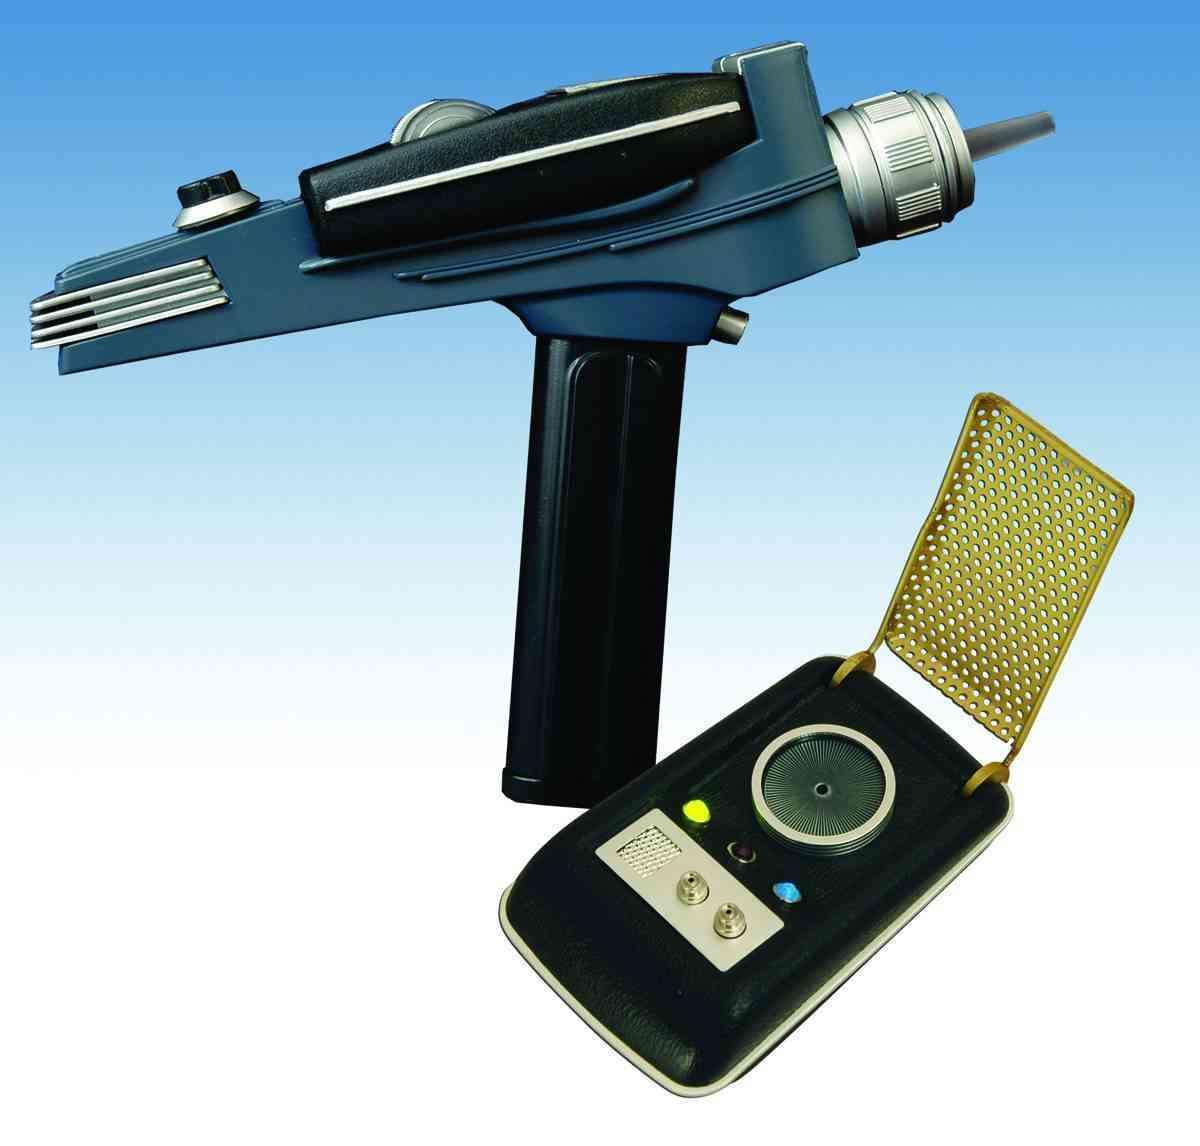 Star Trek Communicator and Phaser (Toy)